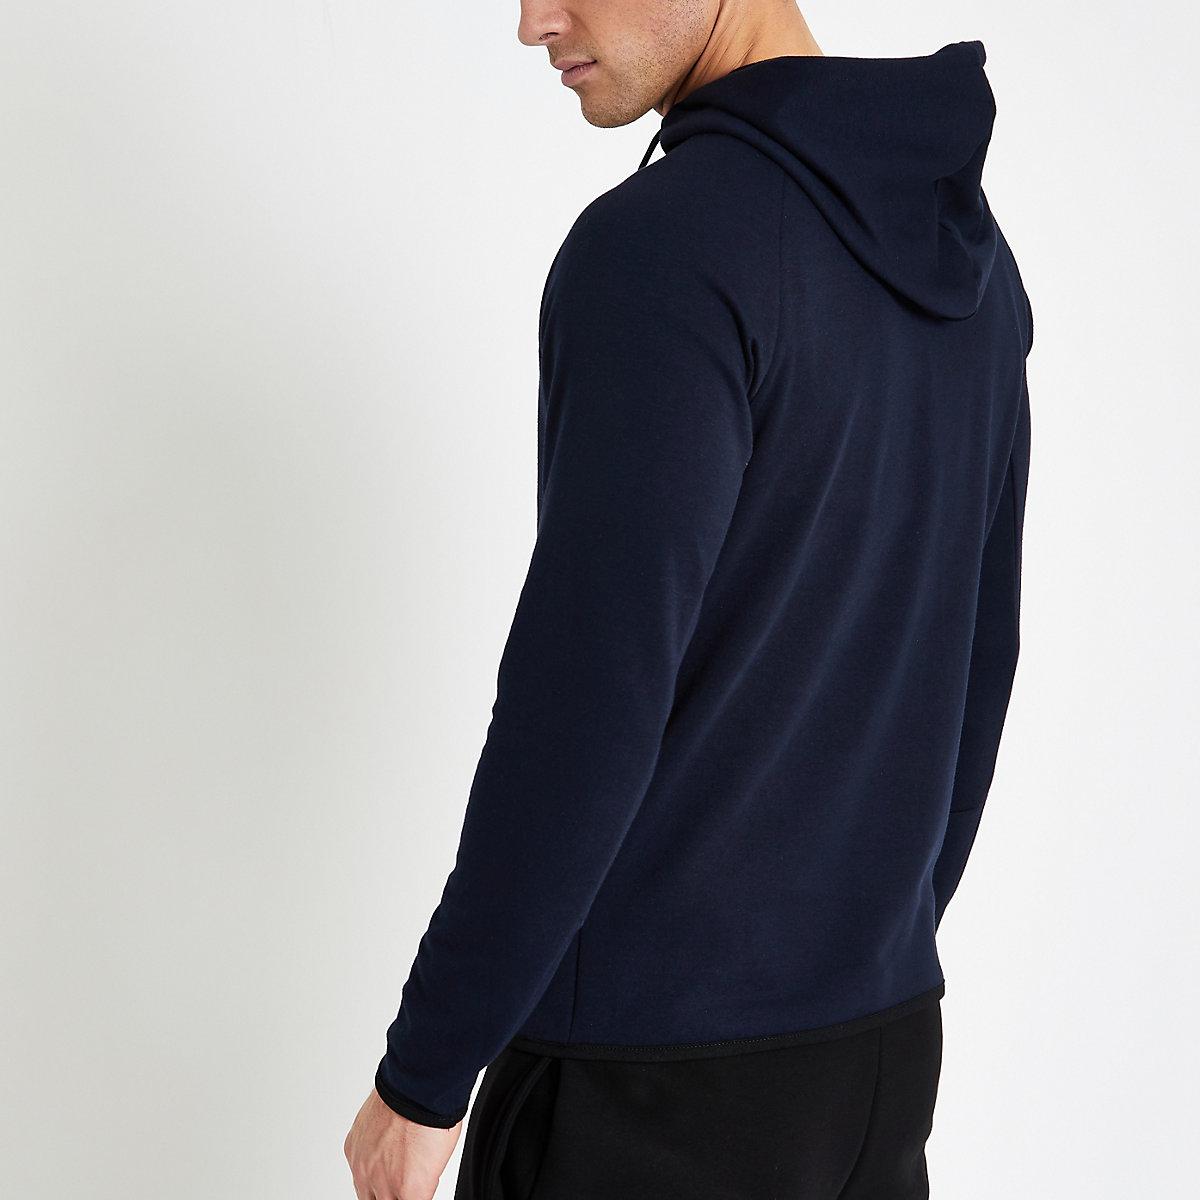 Jack   Jones navy zip up hoodie - Hoodies - Hoodies   Sweatshirts - men 84f41b374b8